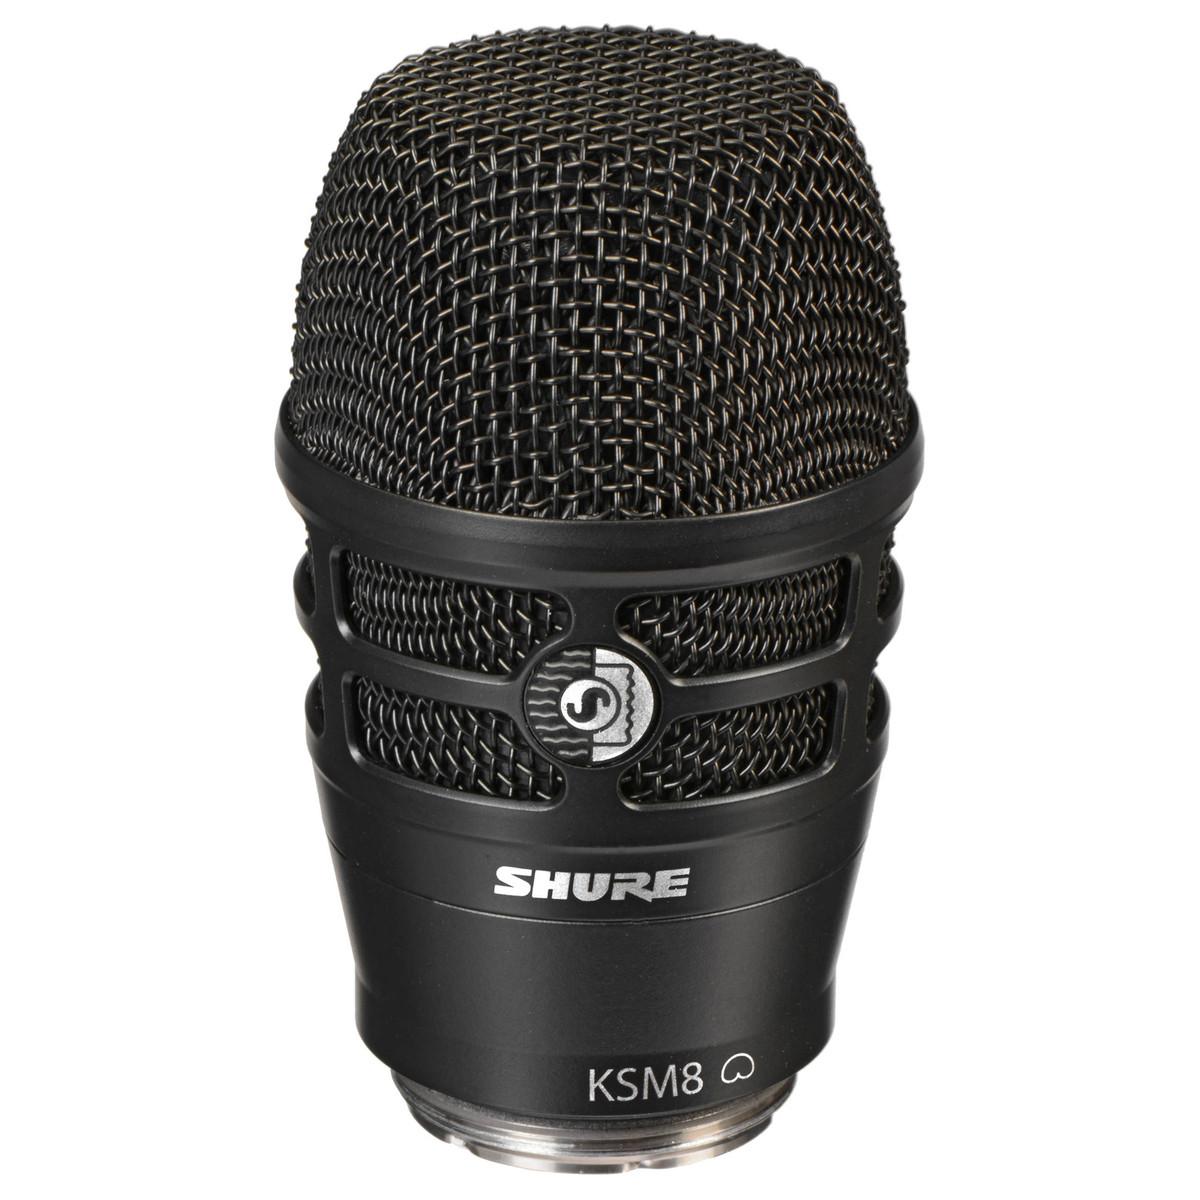 Shure KSM8 Dualdyne Dual Diaphragm Dynamic Microphone ...